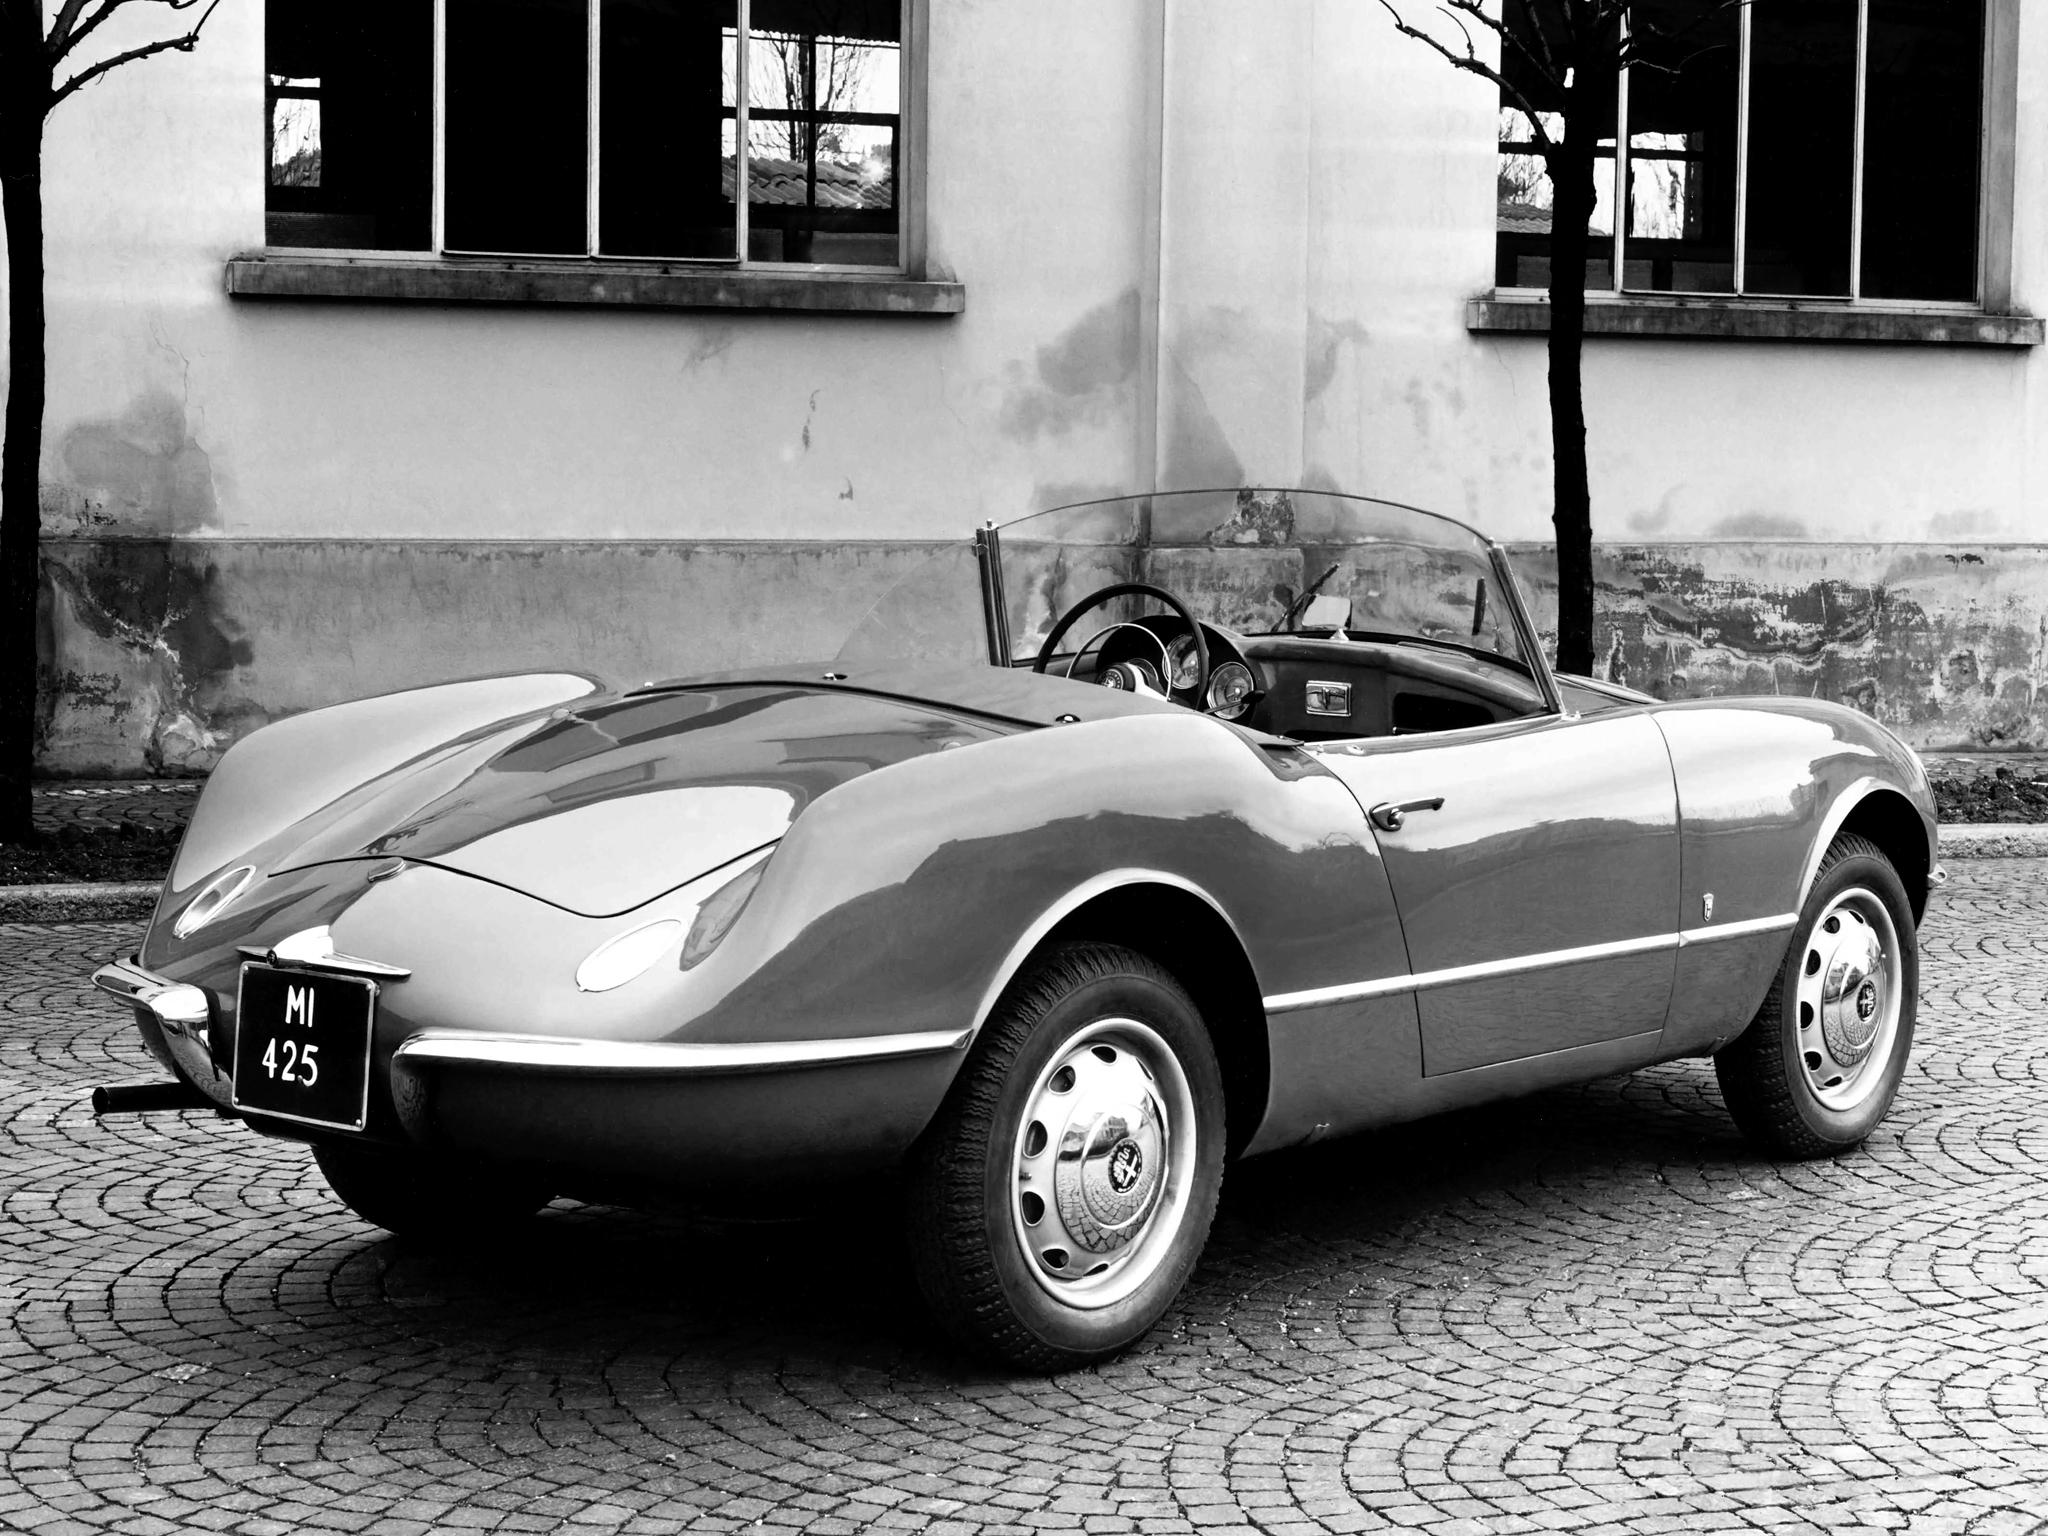 1955 Alfa Romeo Giulietta Spider (Bertone) - Студии